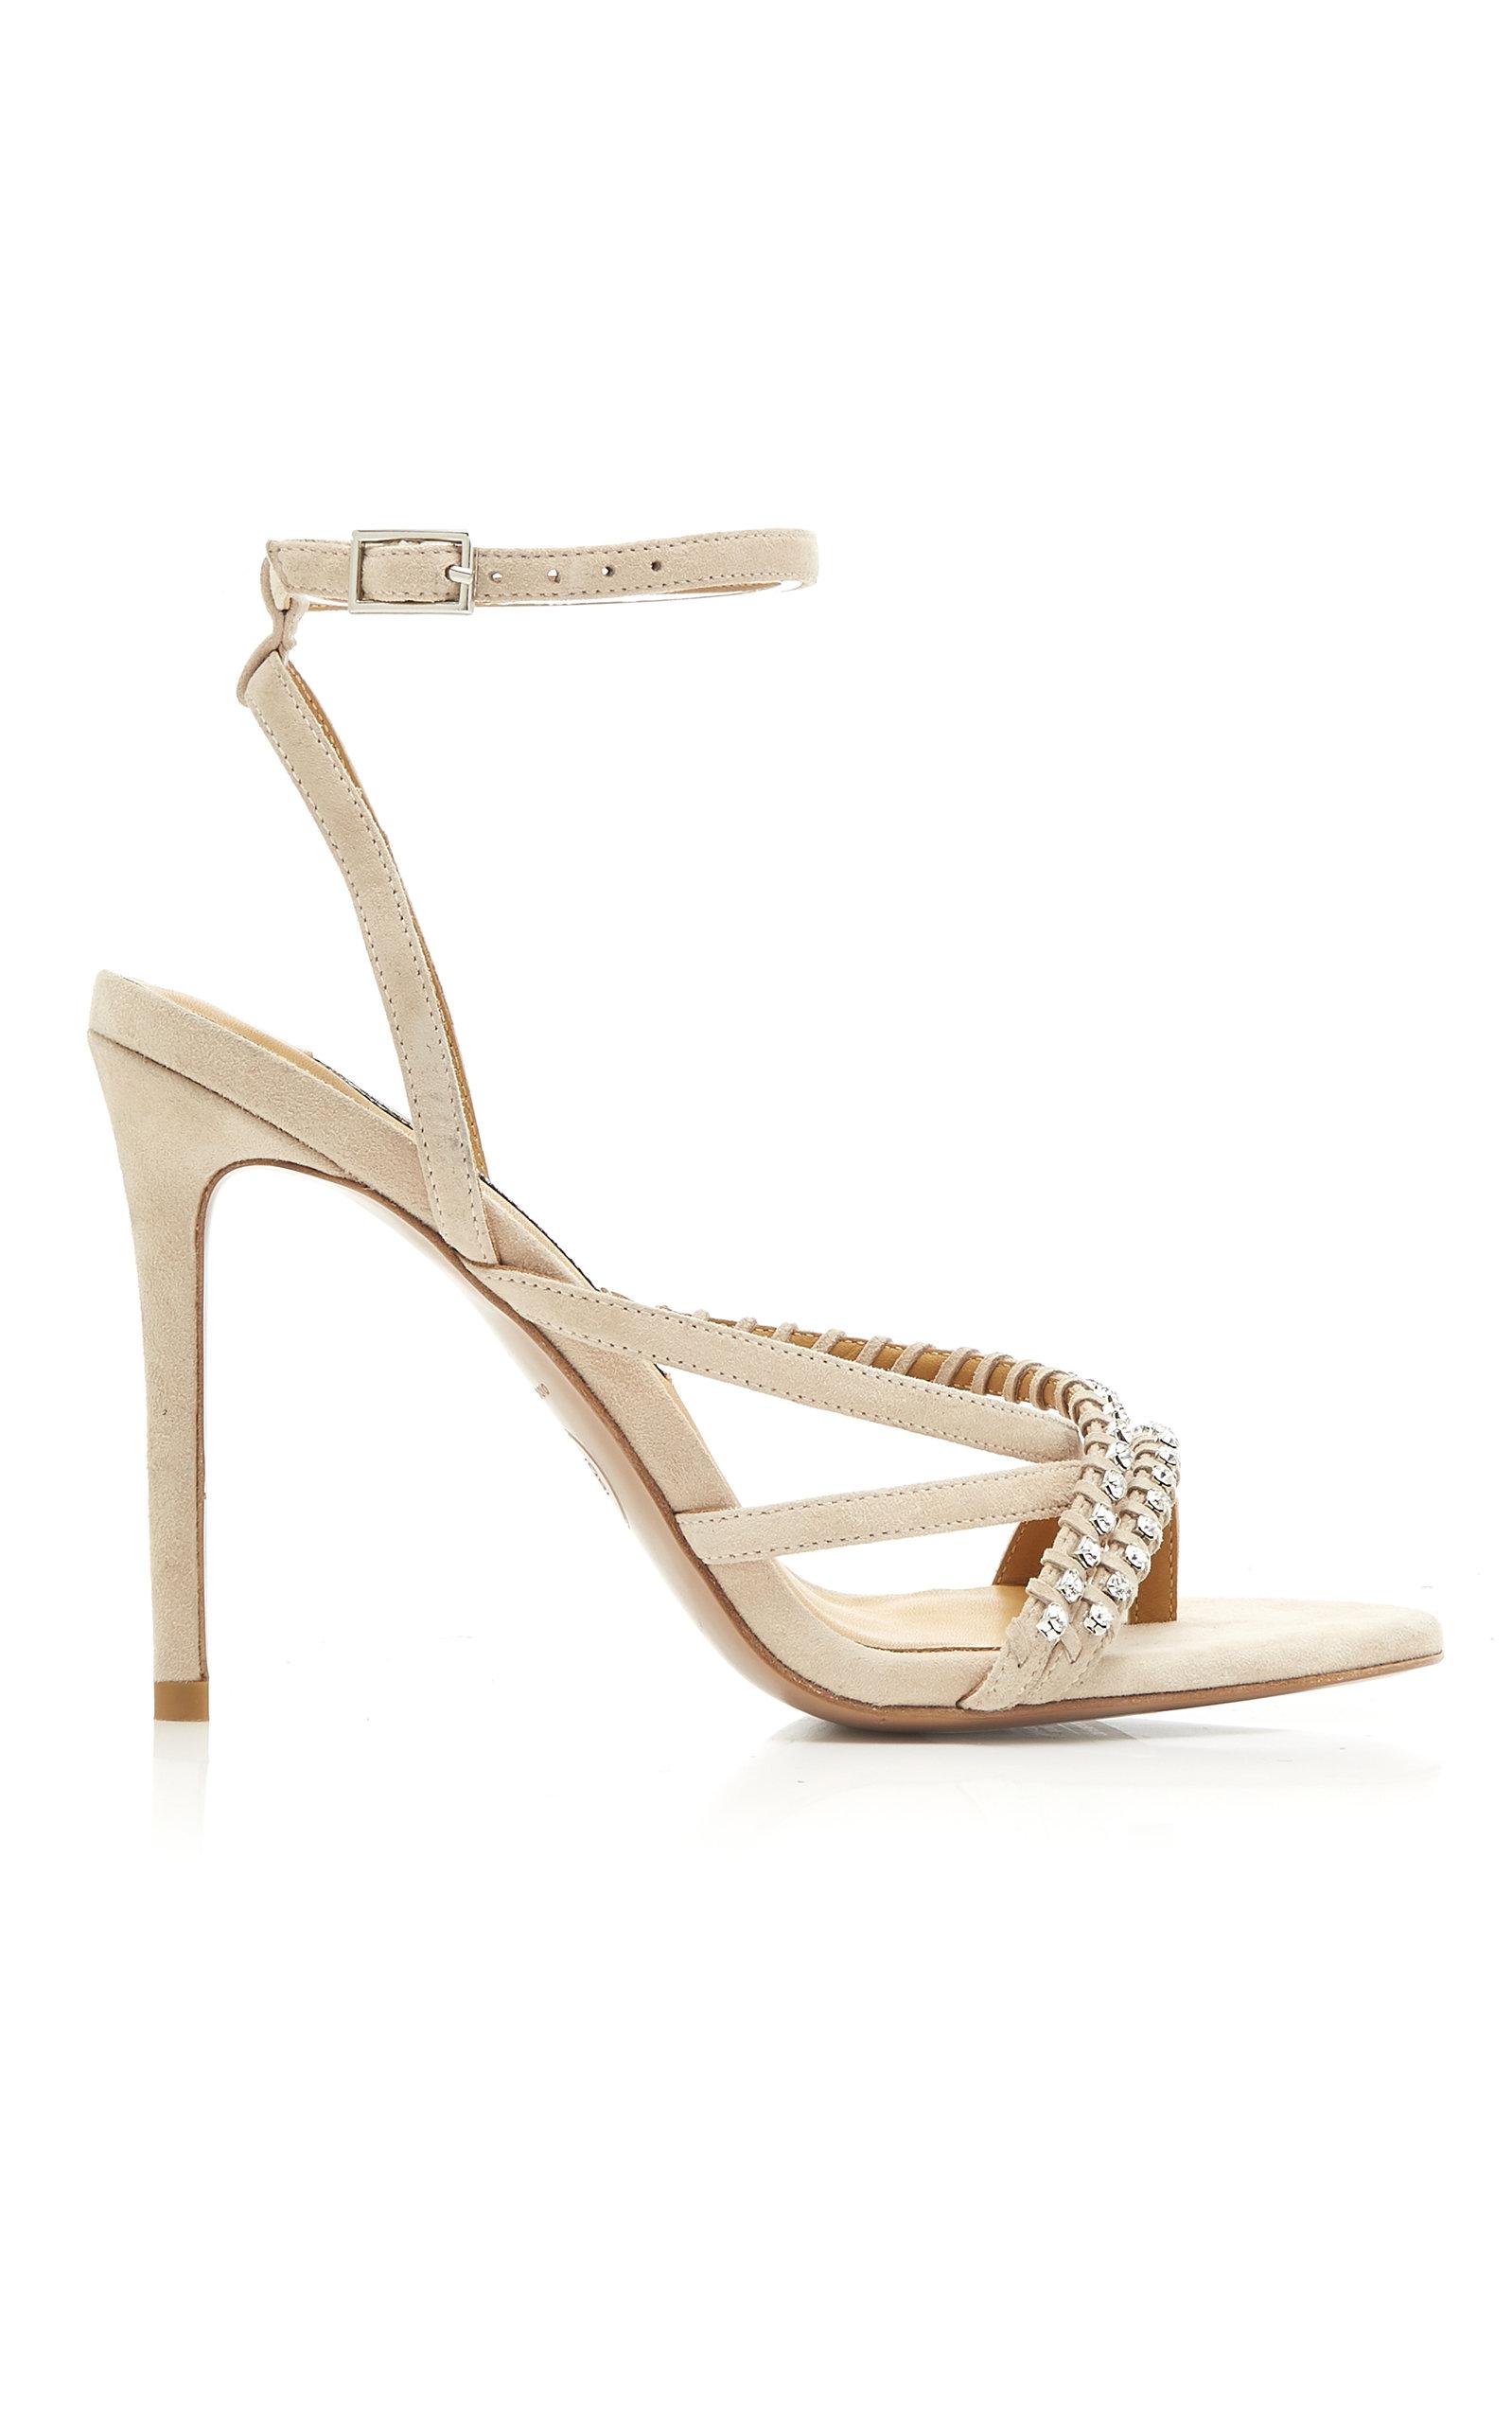 d40f46c55 Veronica Beard Noelle Crystal Suede Sandals In Neutral   ModeSens